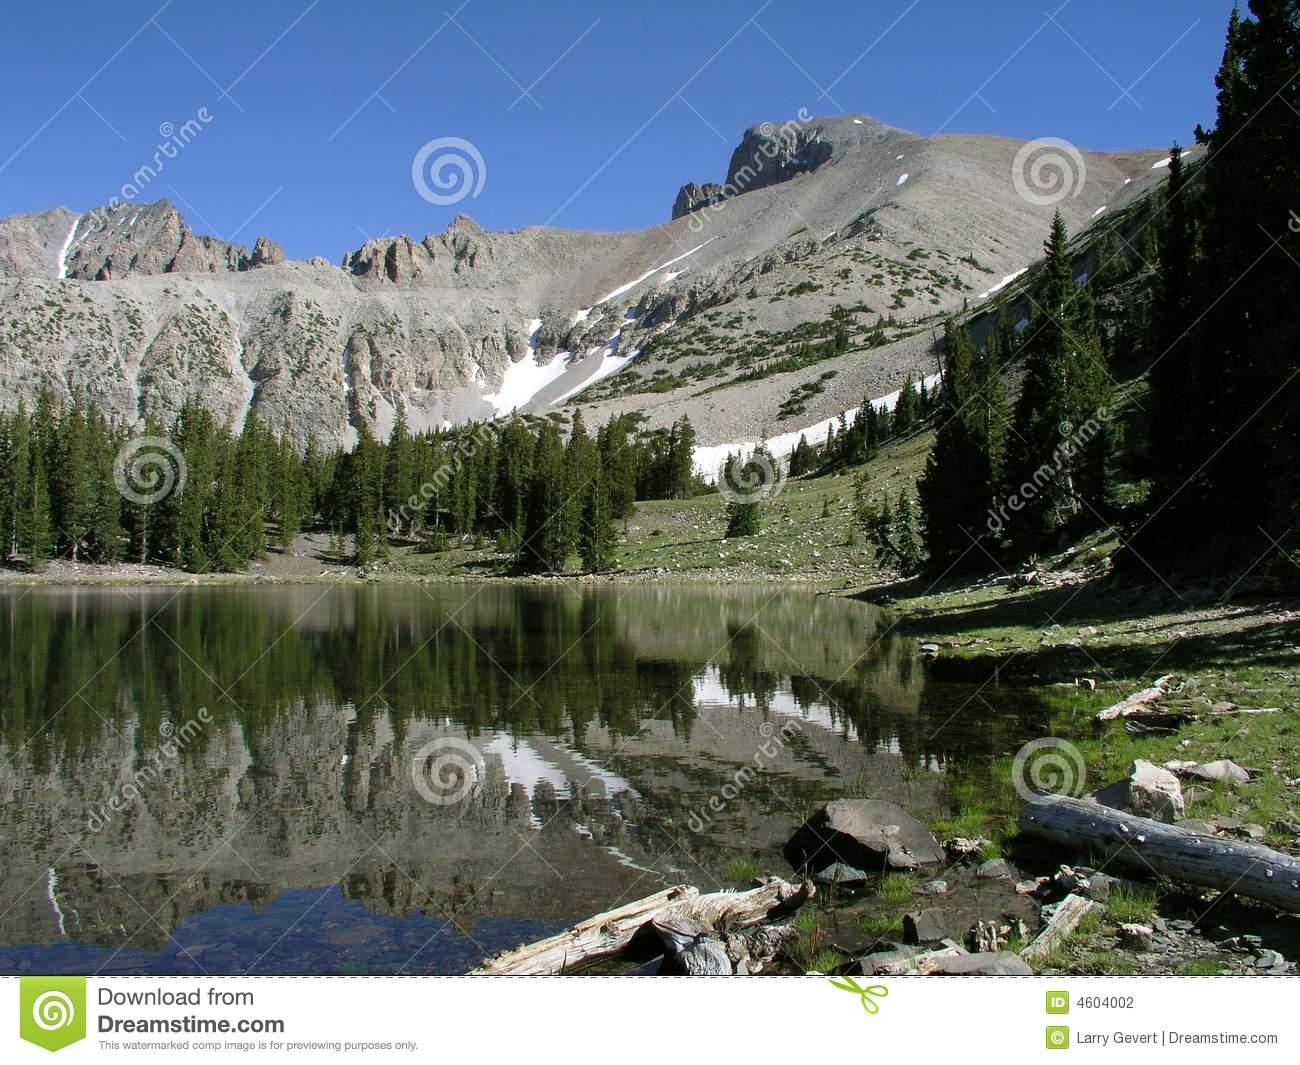 Glacier Below Wheeler Peak In The Great Basin National Park.